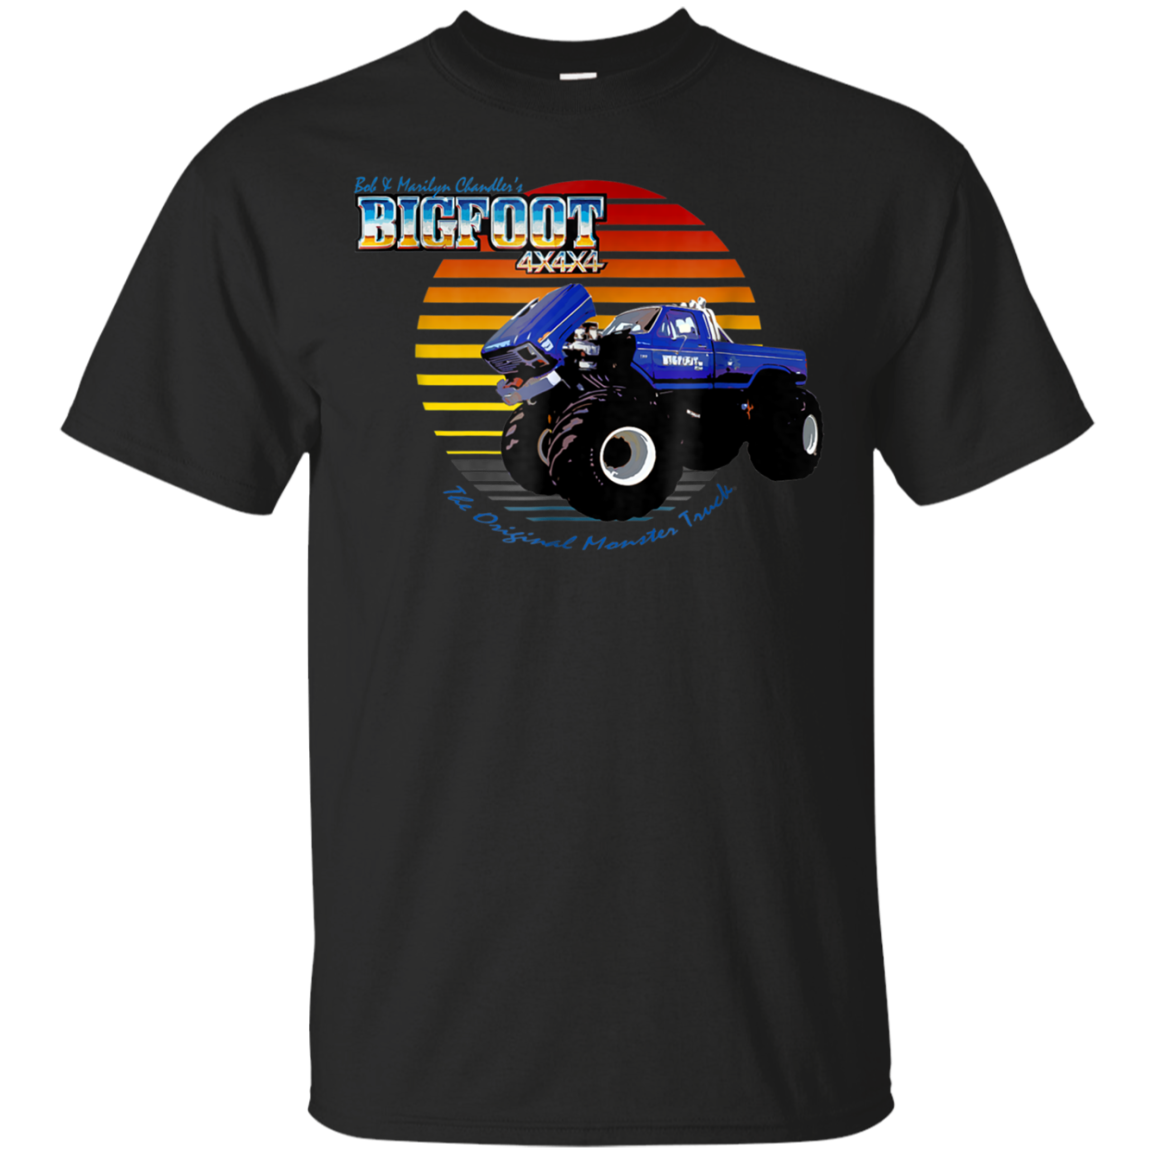 Retro Sunset T Shirt Tula Store